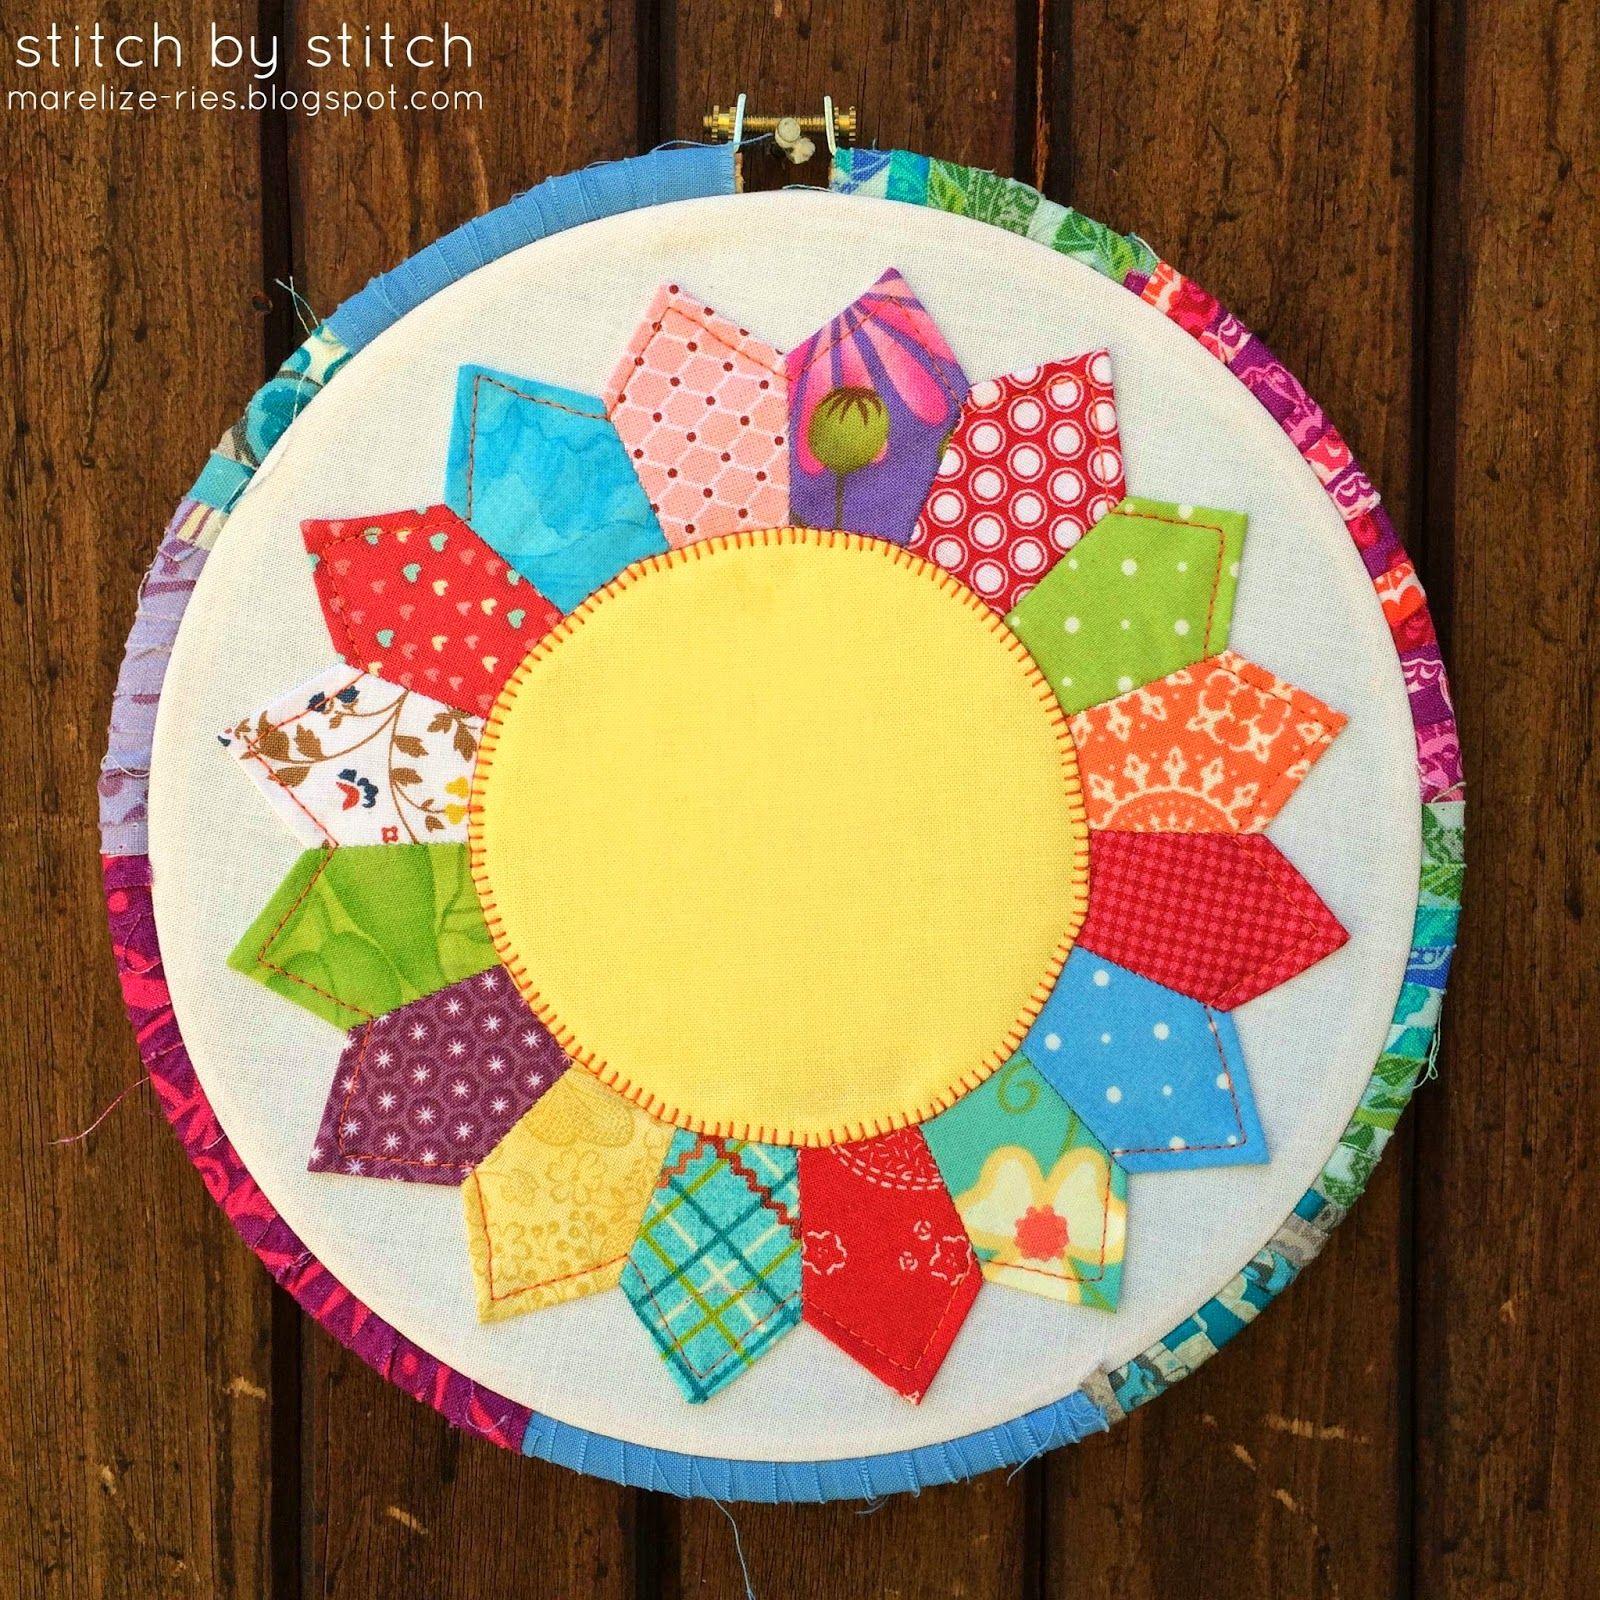 Stitch by Stitch: From Scraps to something Pretty!